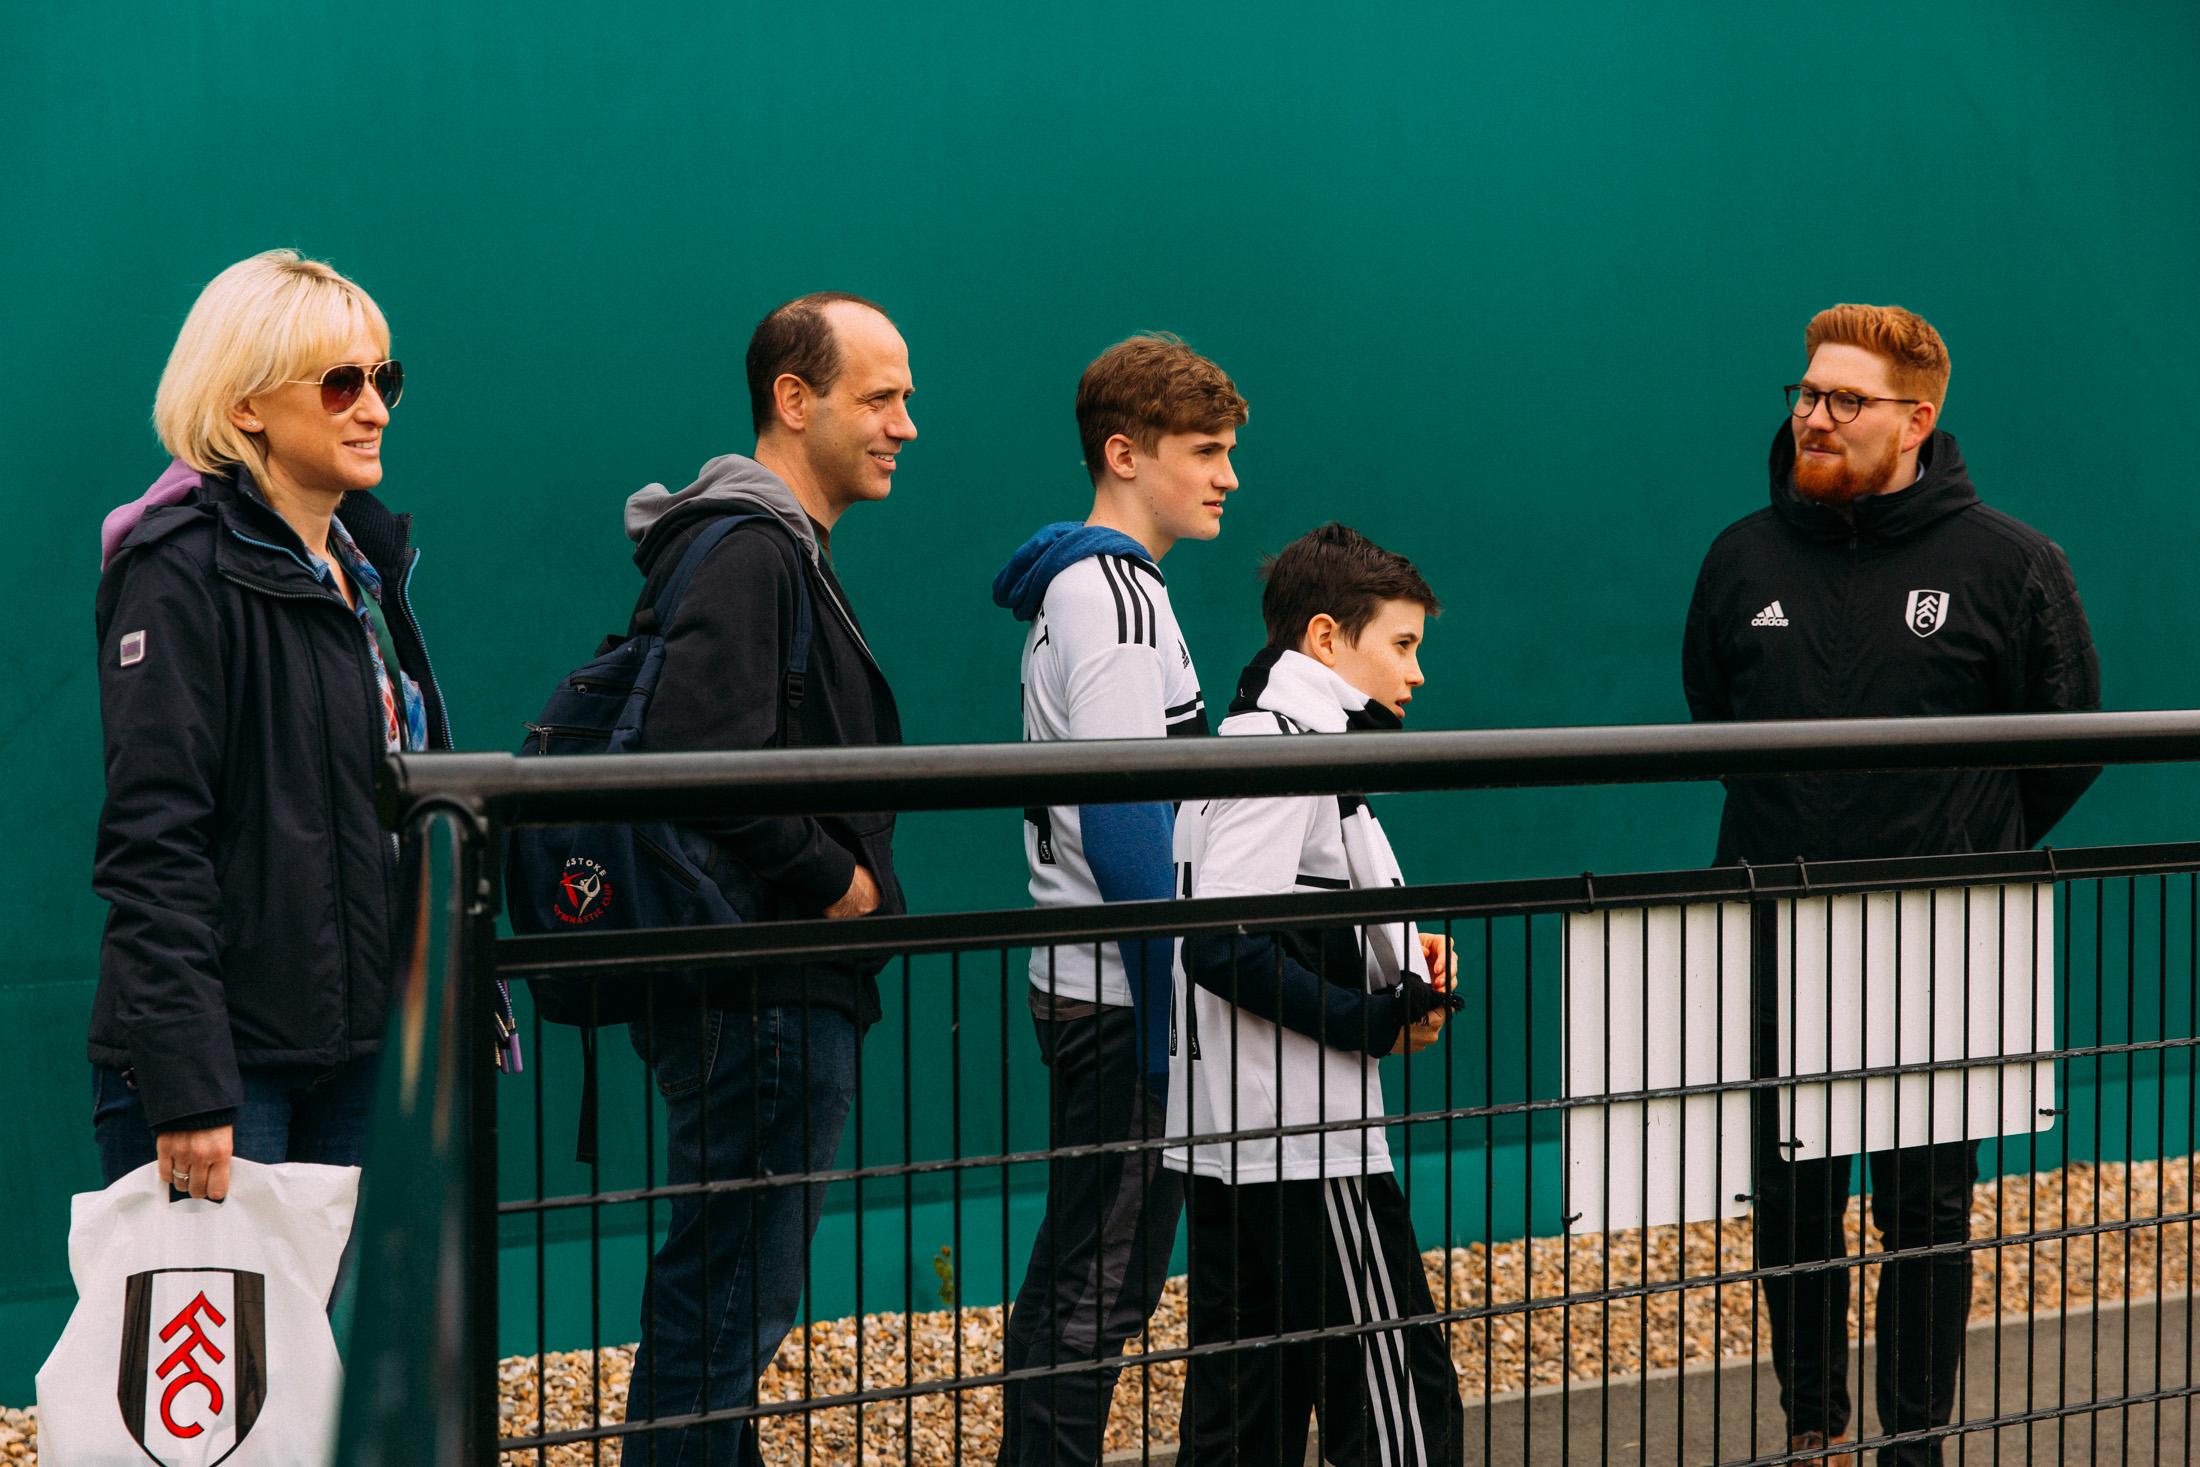 Event Photographer London-5.jpg